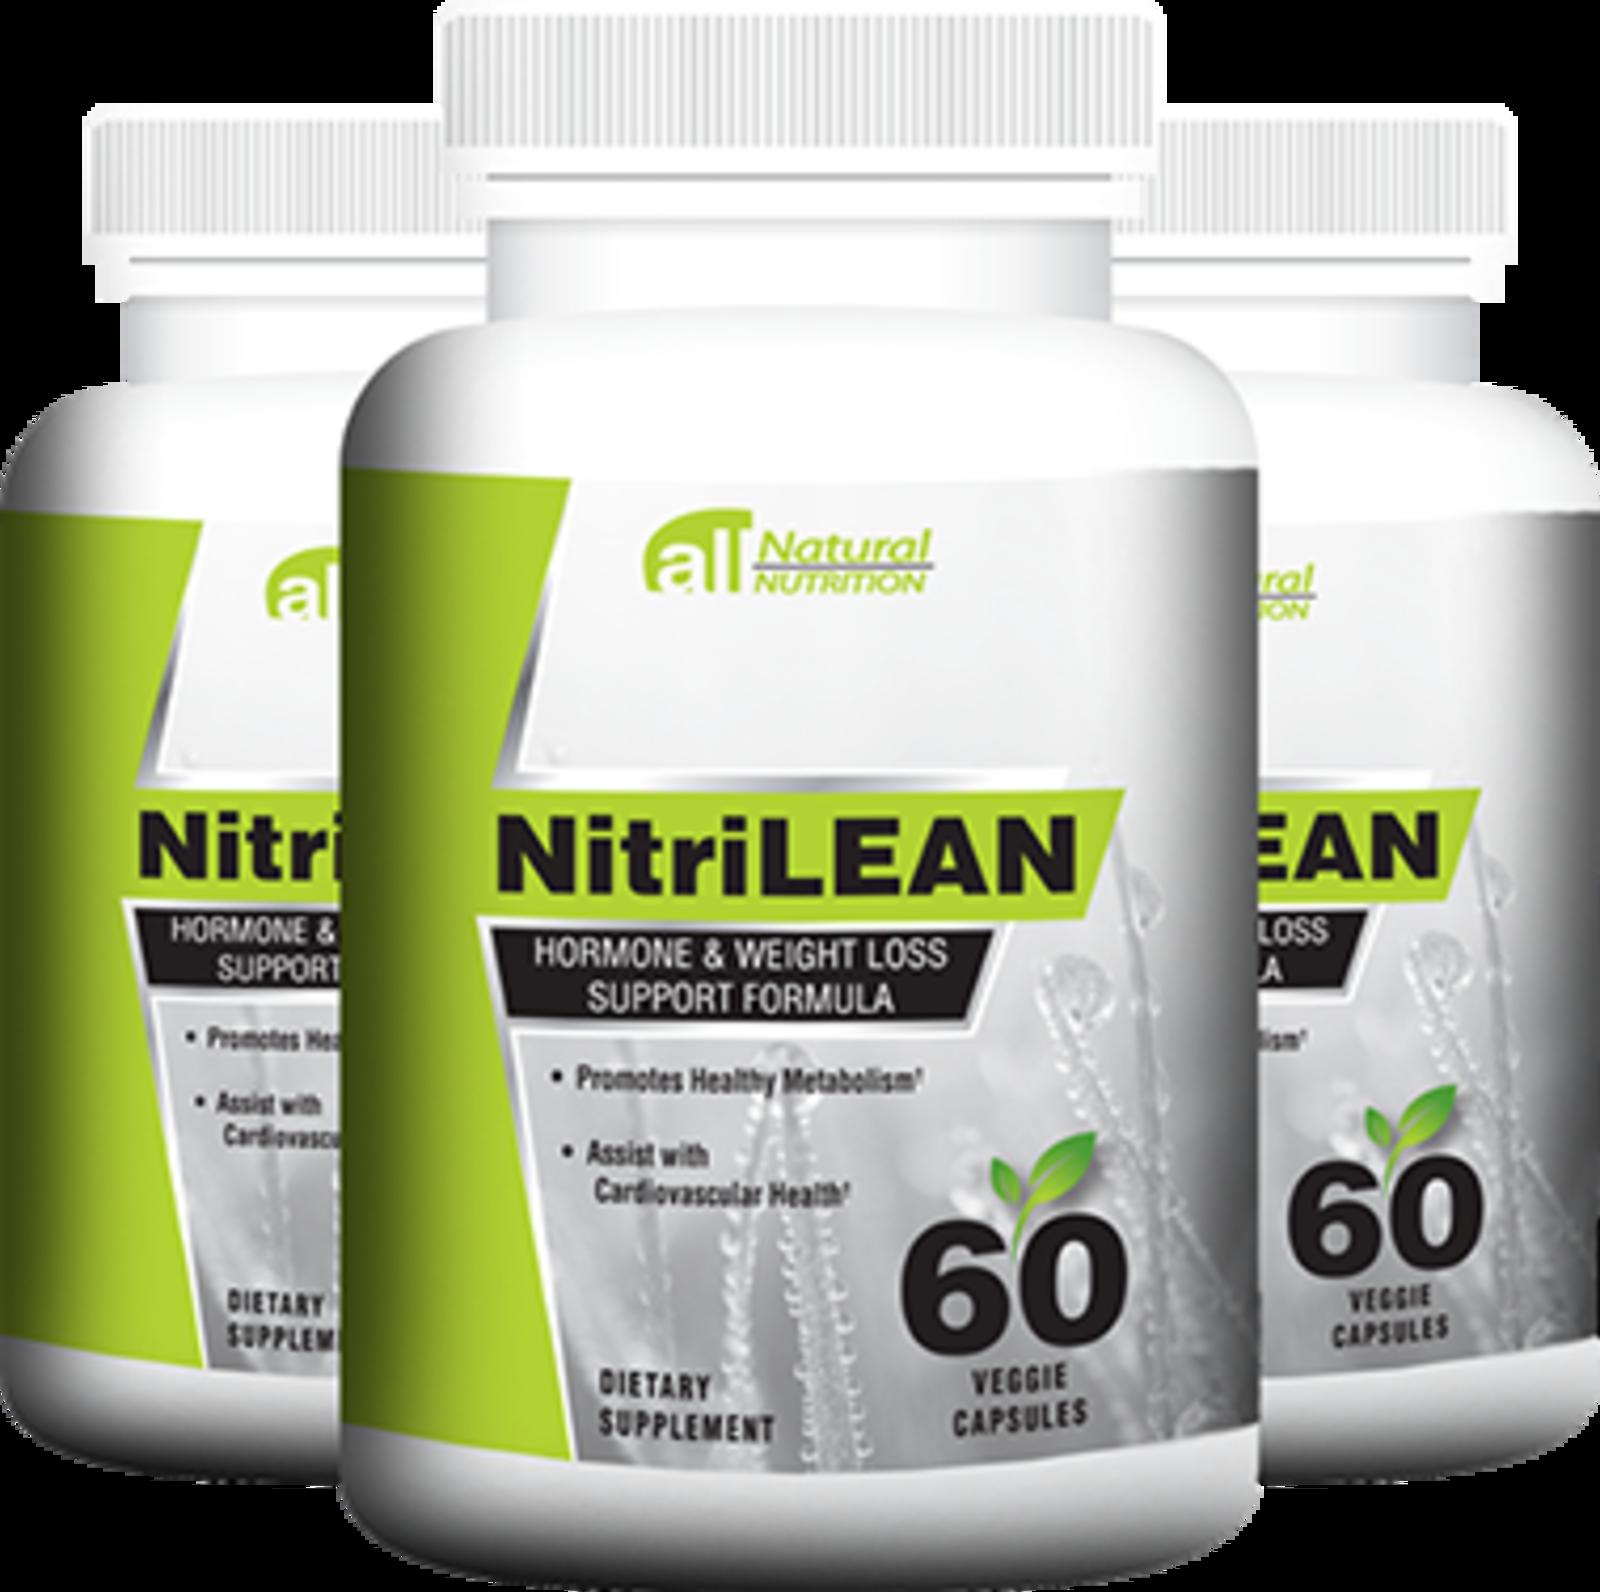 NitriLEAN Reviews